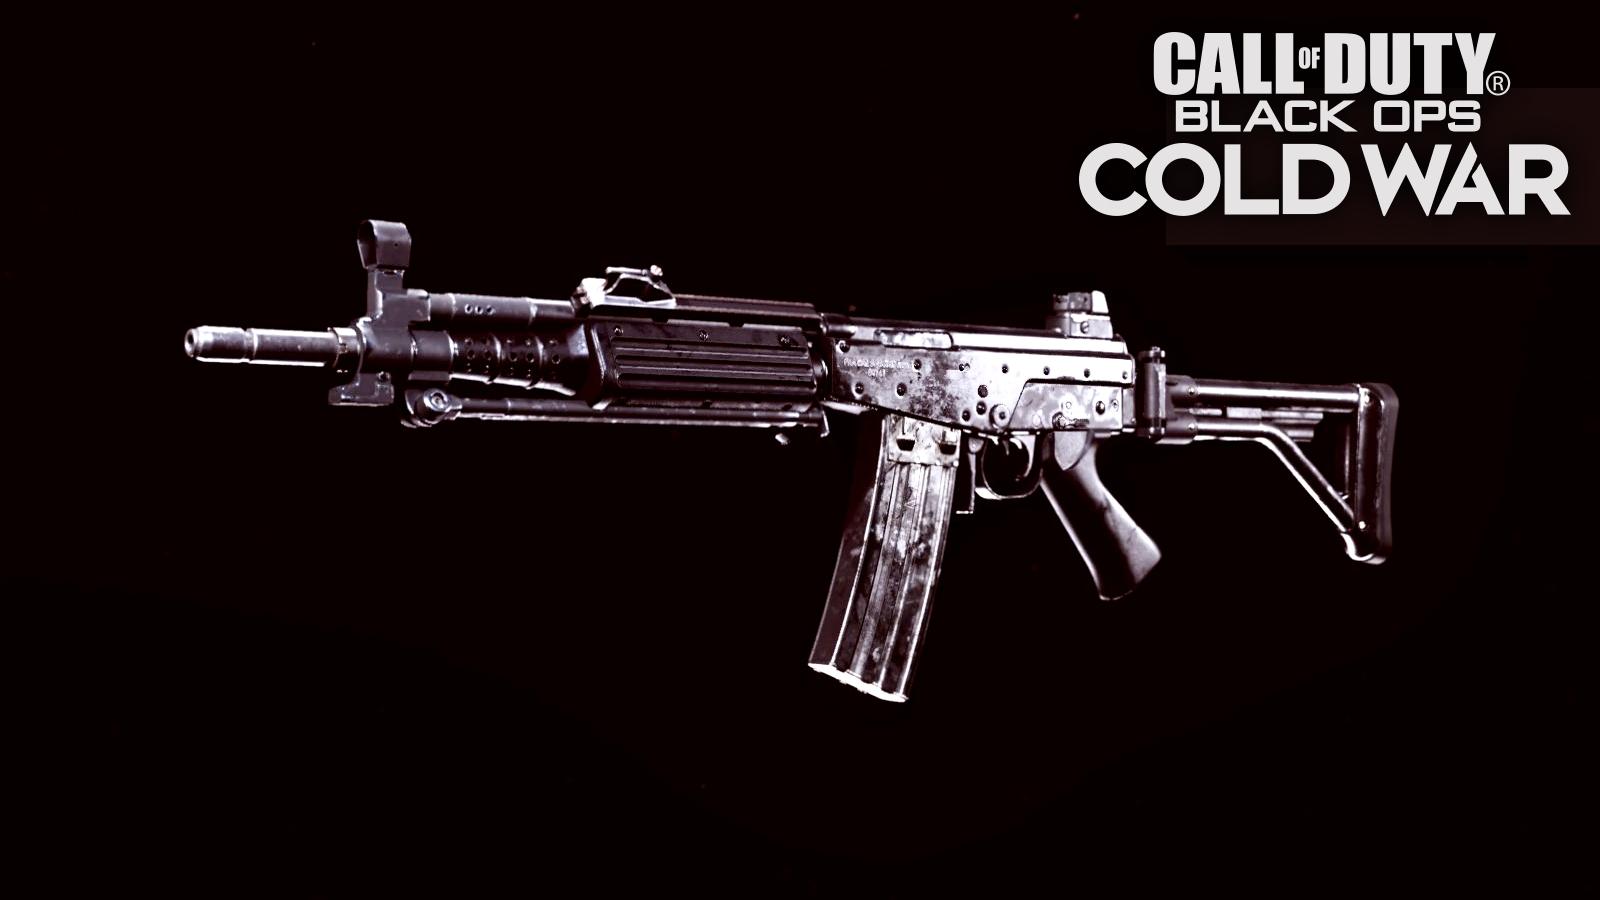 【CoD:BOCW】FARA83の性能 AKと同等の火力を持つ新武器AR